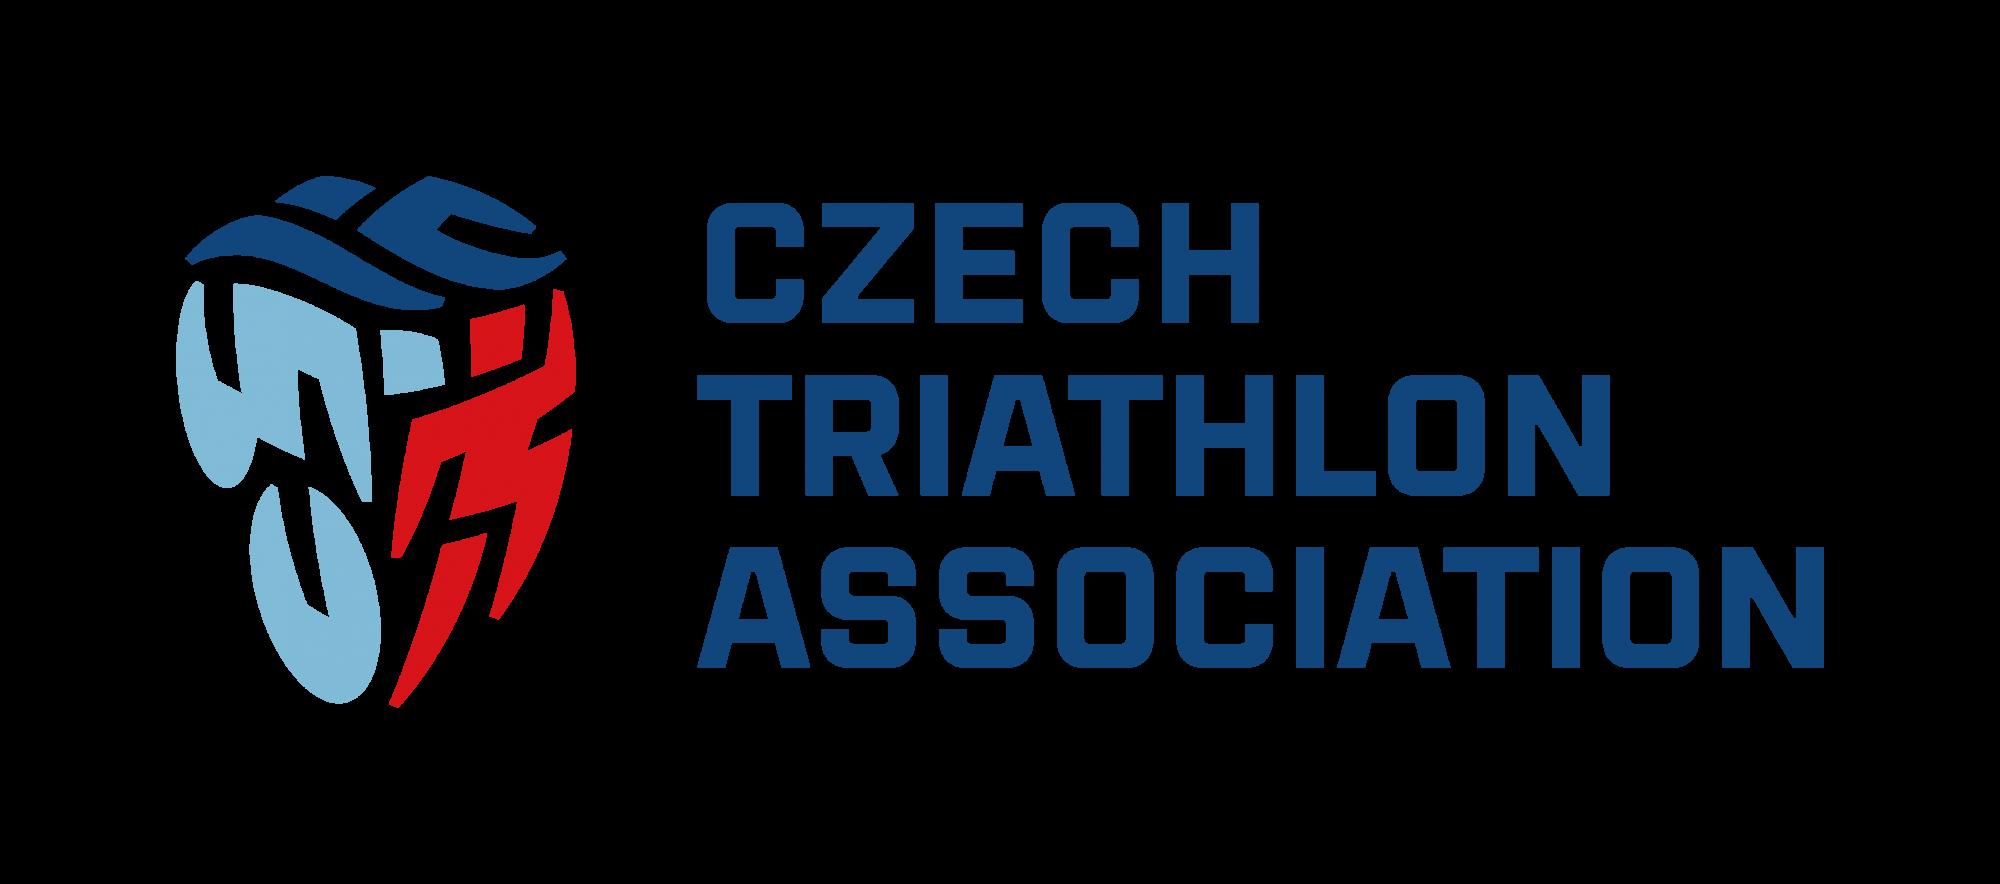 Czech Triathlon Association logo